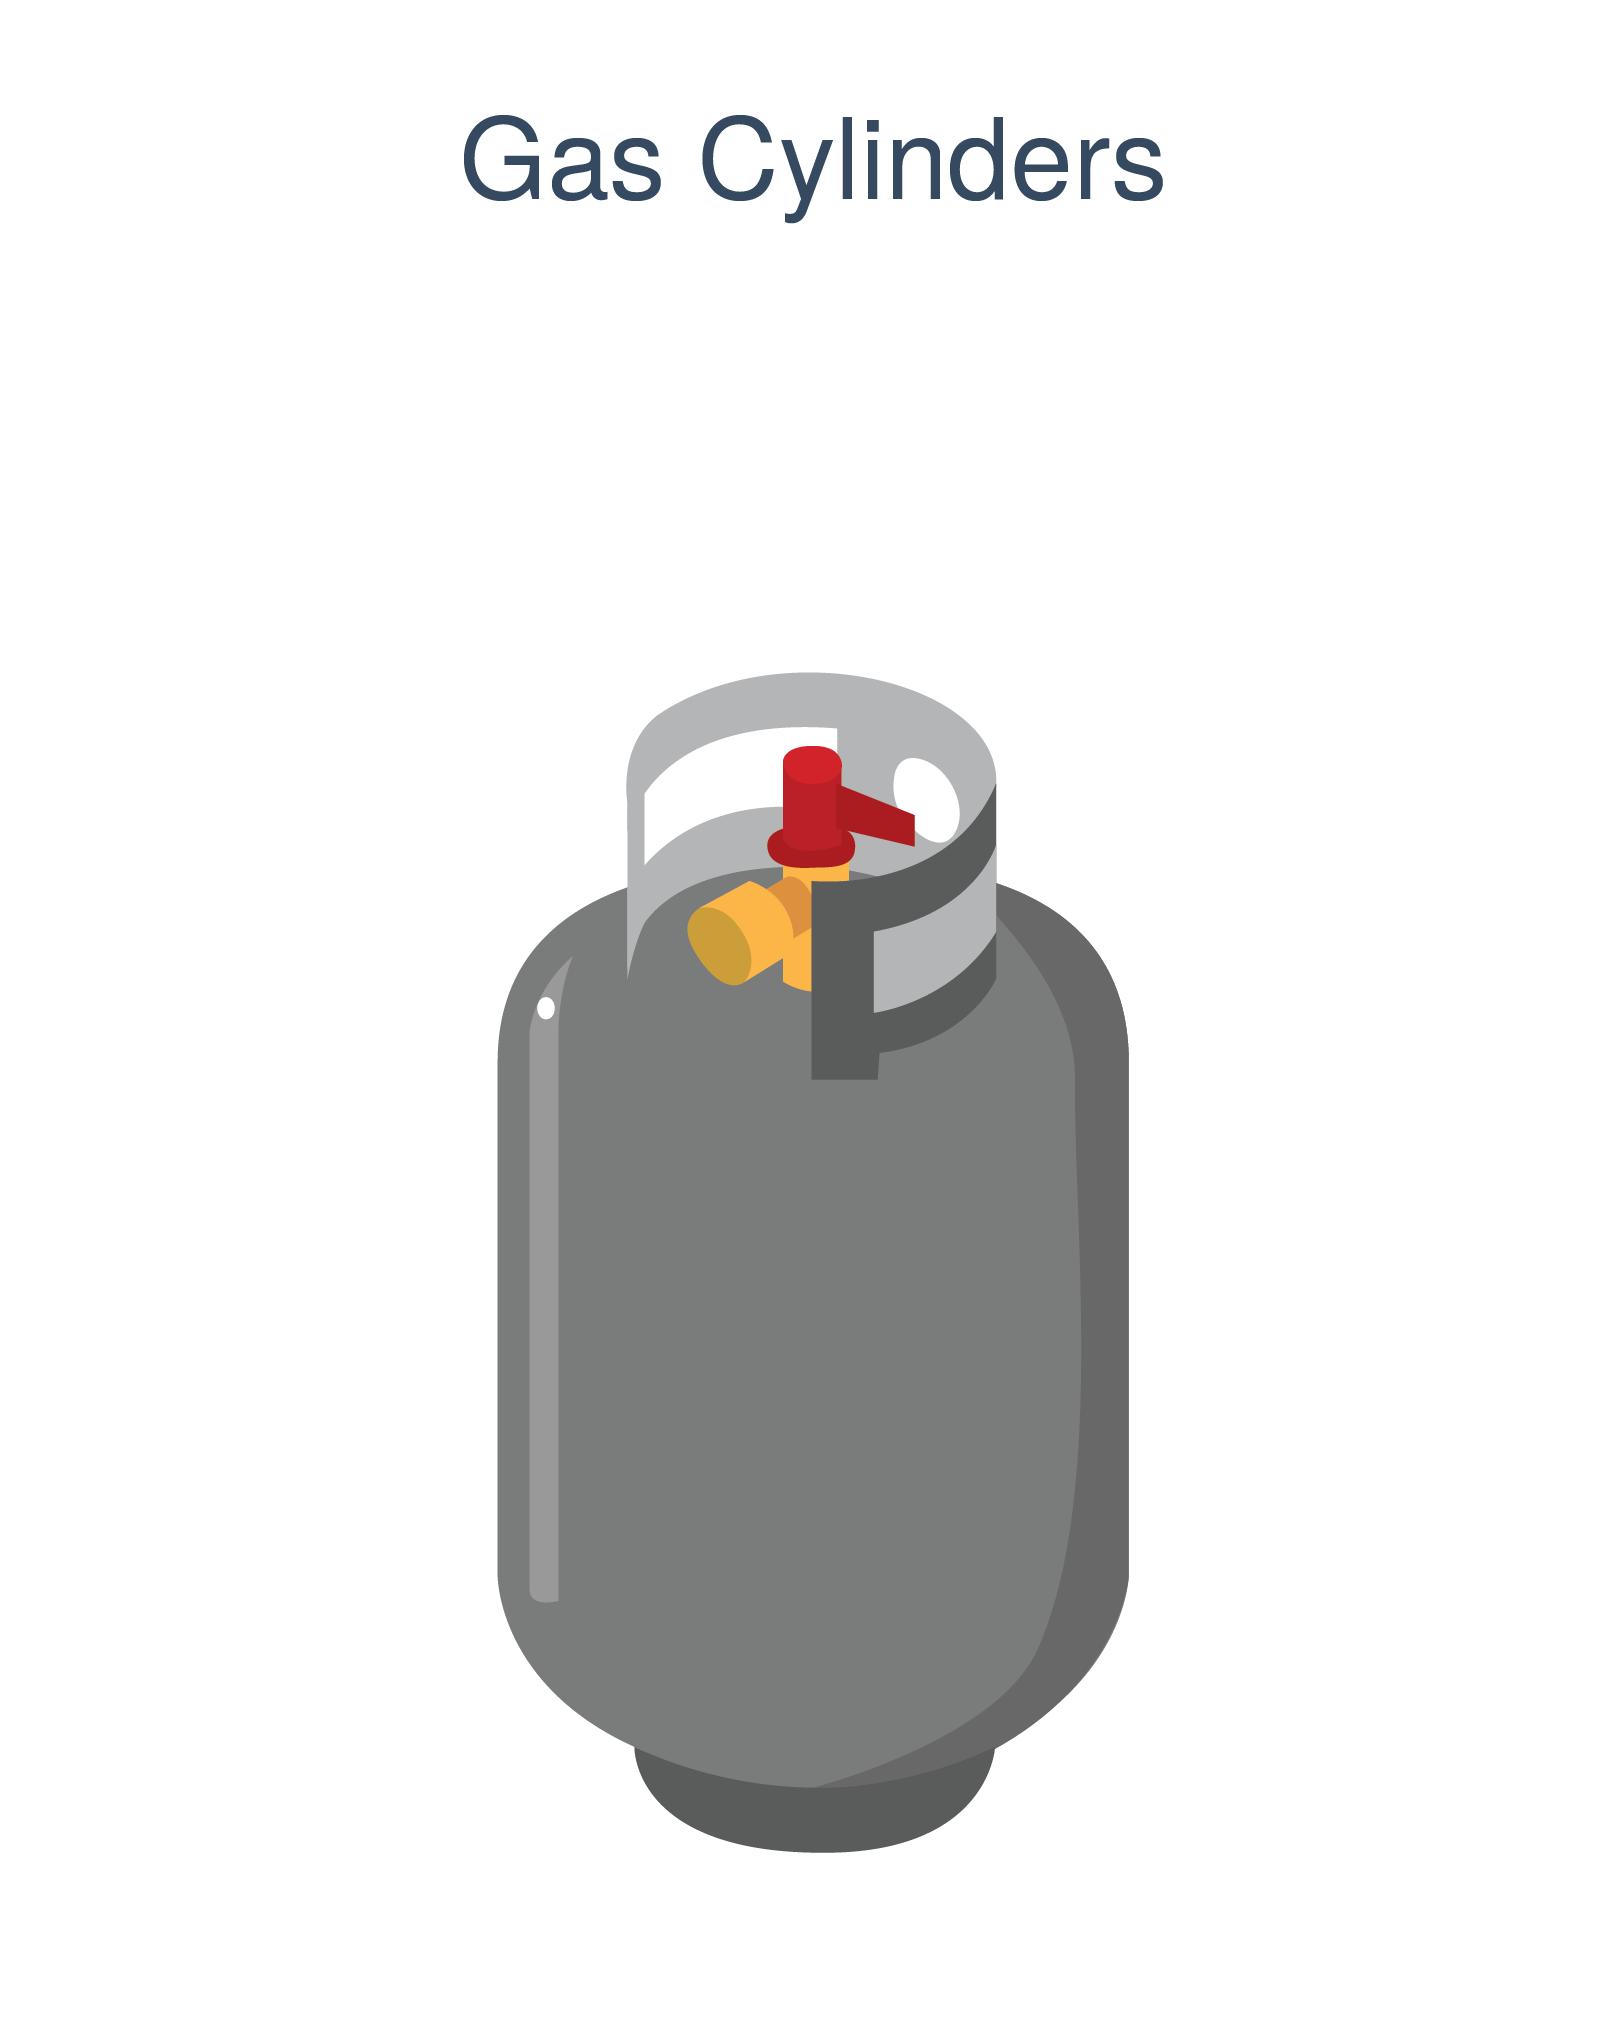 honest broker gas cylinder